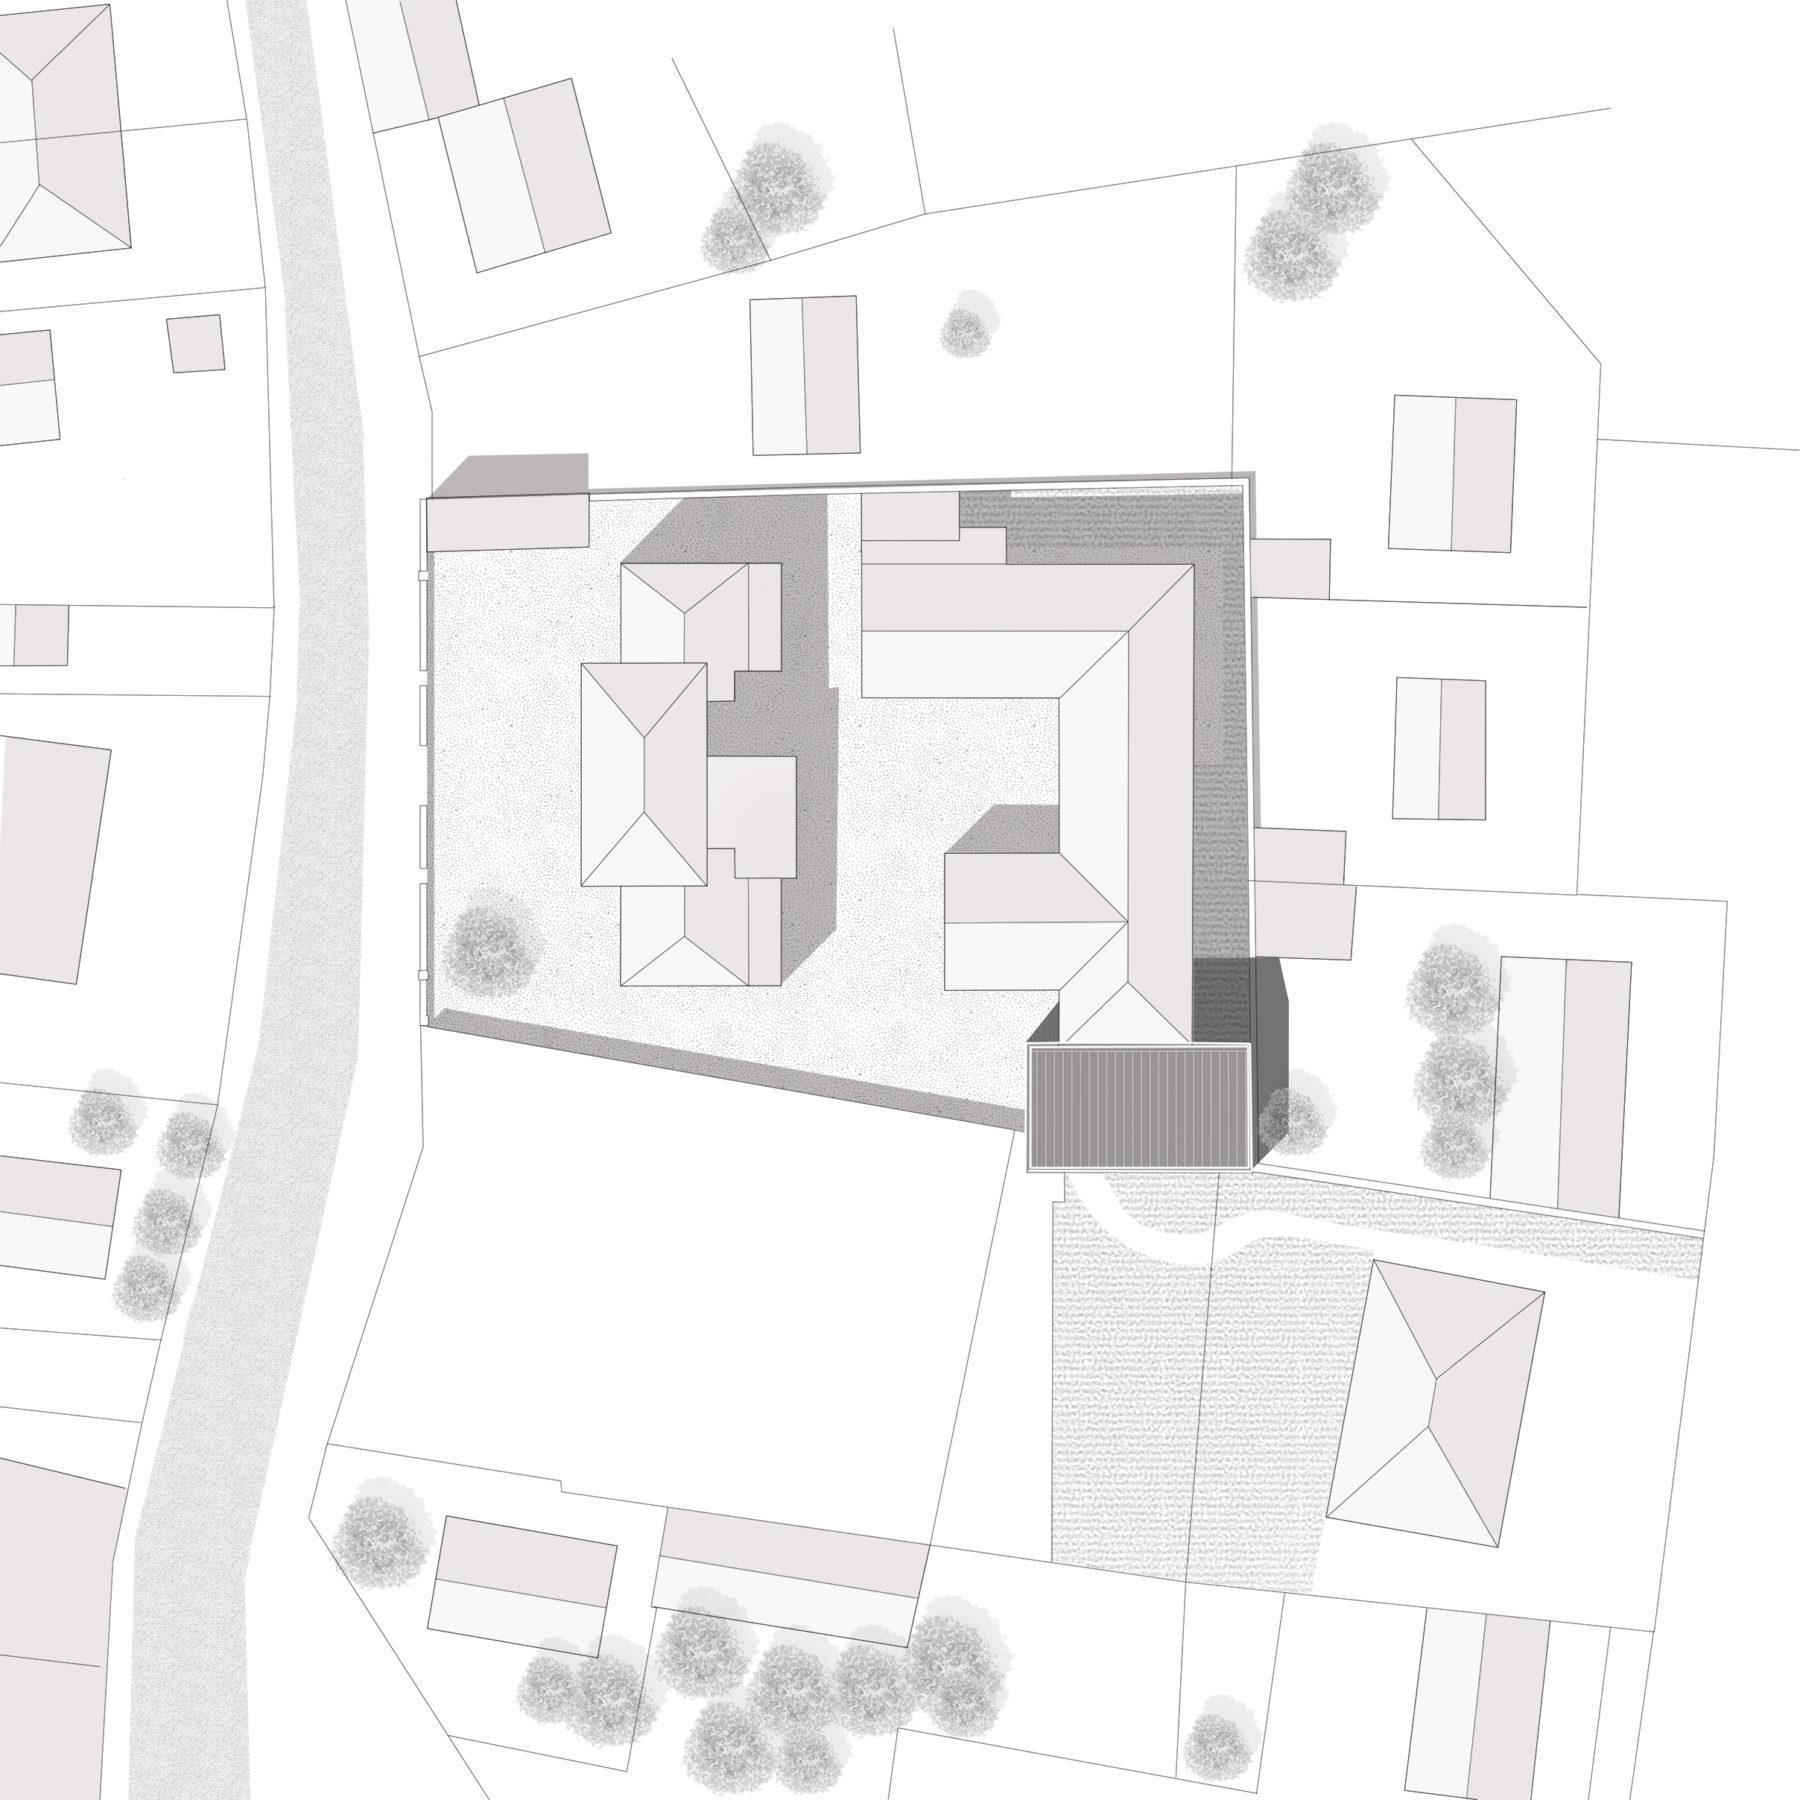 Salle périscolaire - Chambry - Plan masse